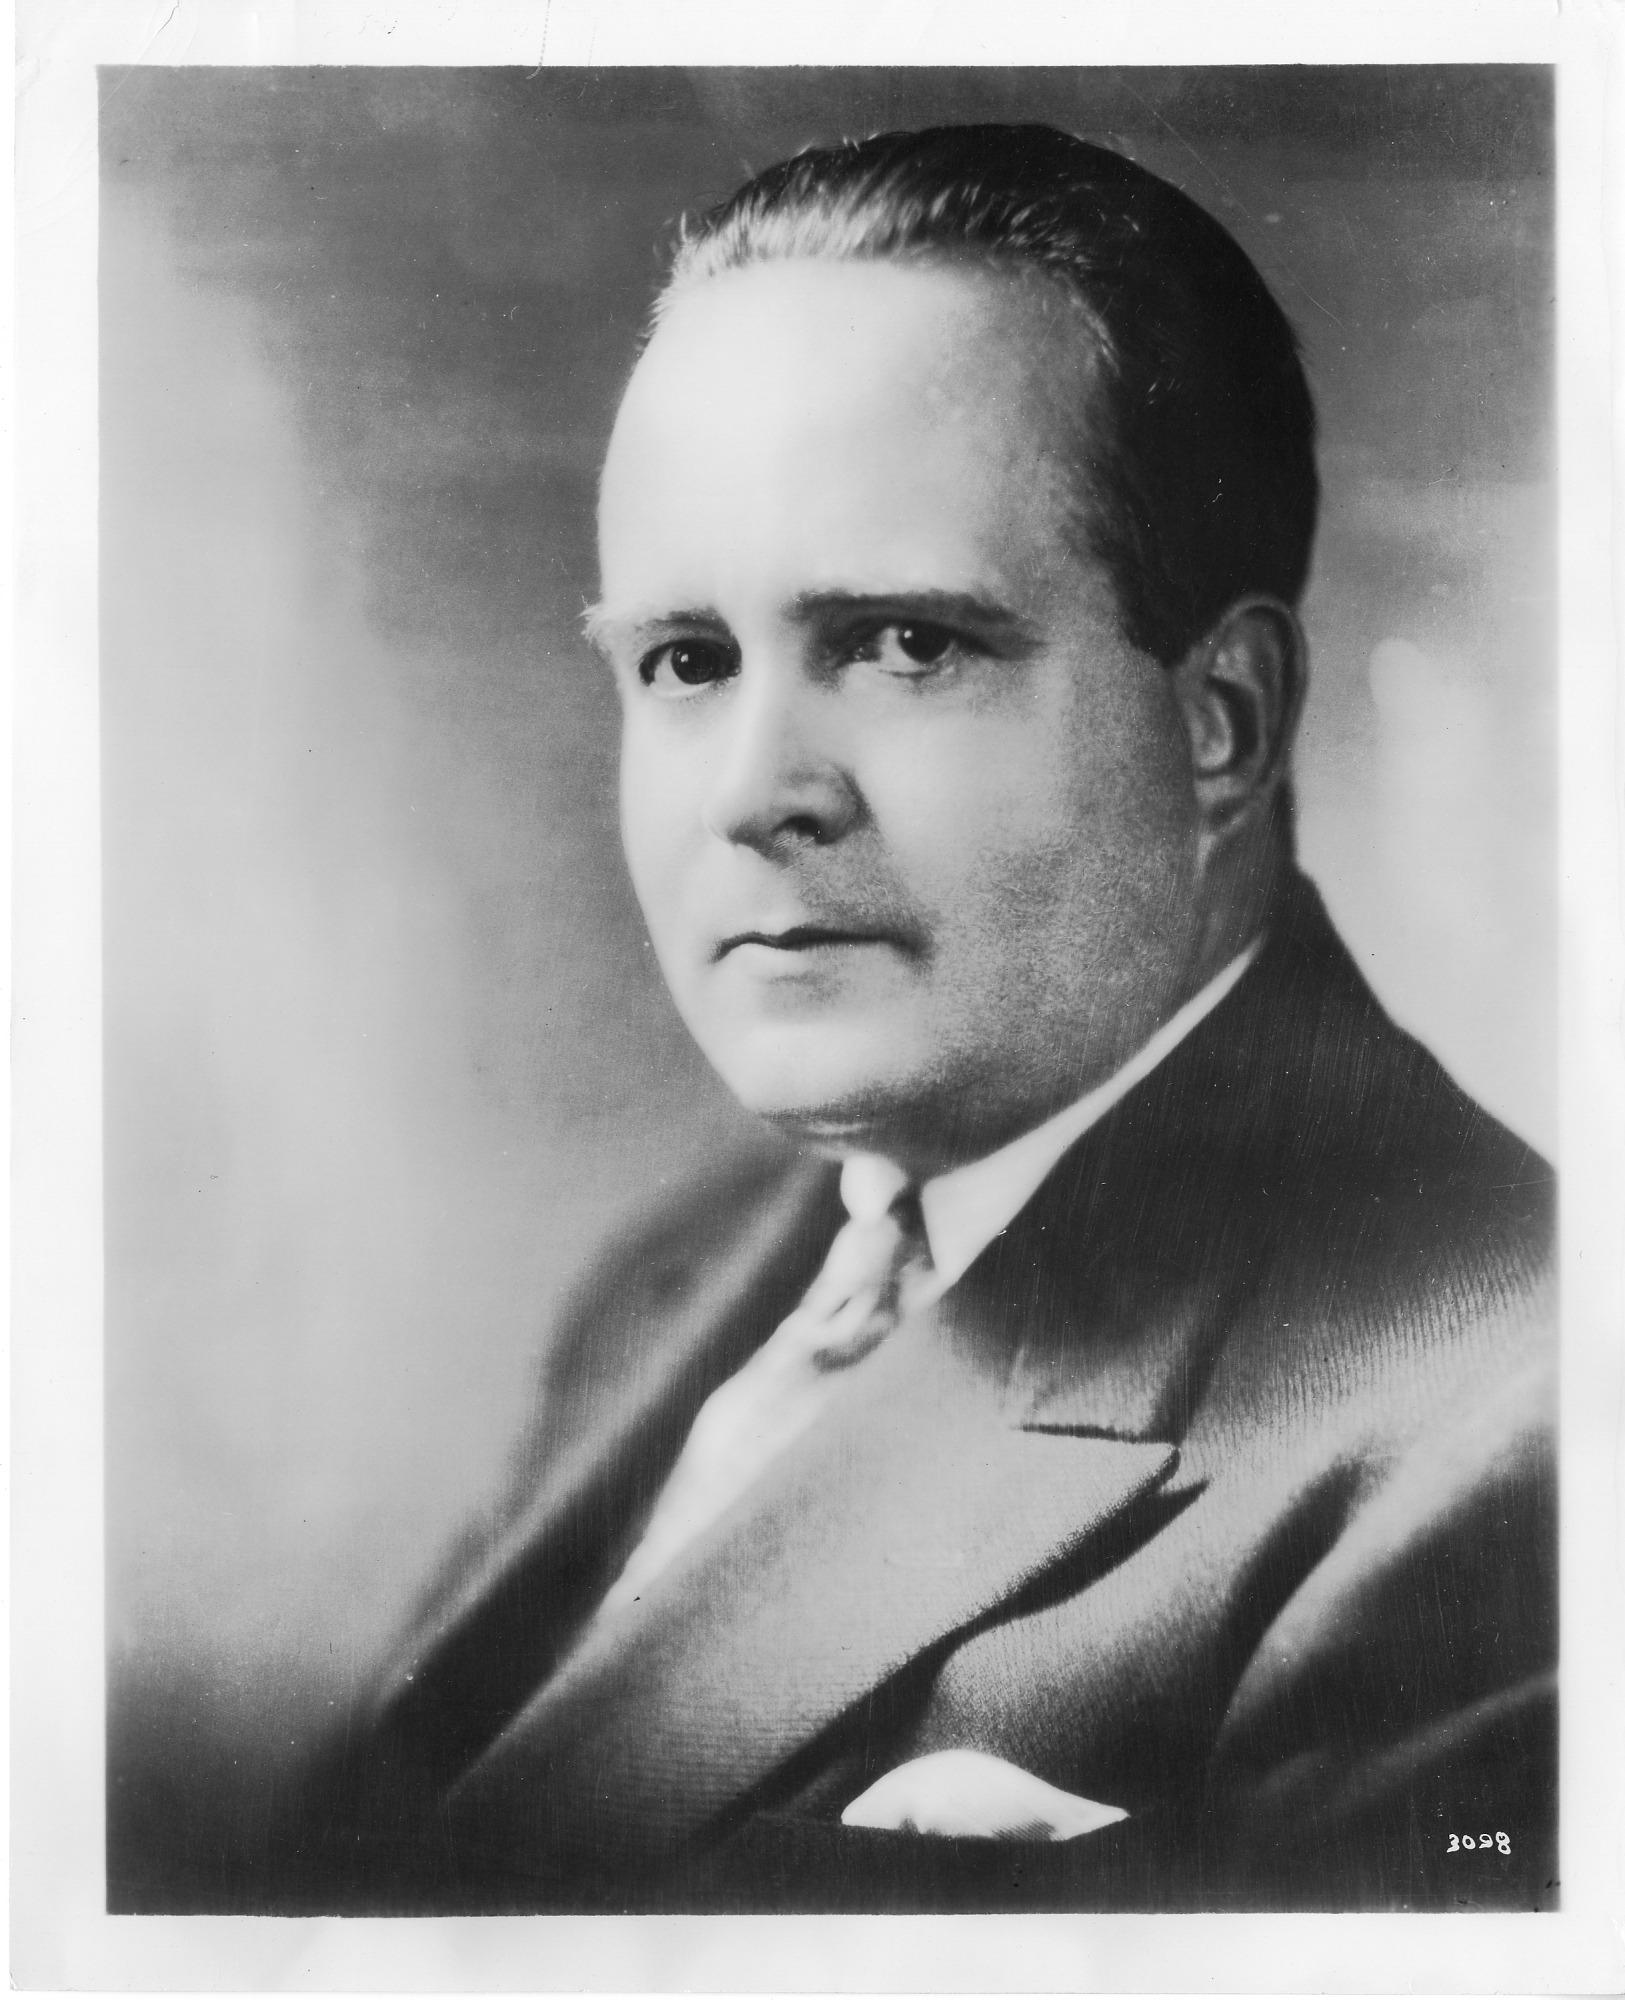 Juan de la Cierva (1895-1936), Smithsonian Institution Archives, SIA Acc. 90-105 [SIA2008-0106].